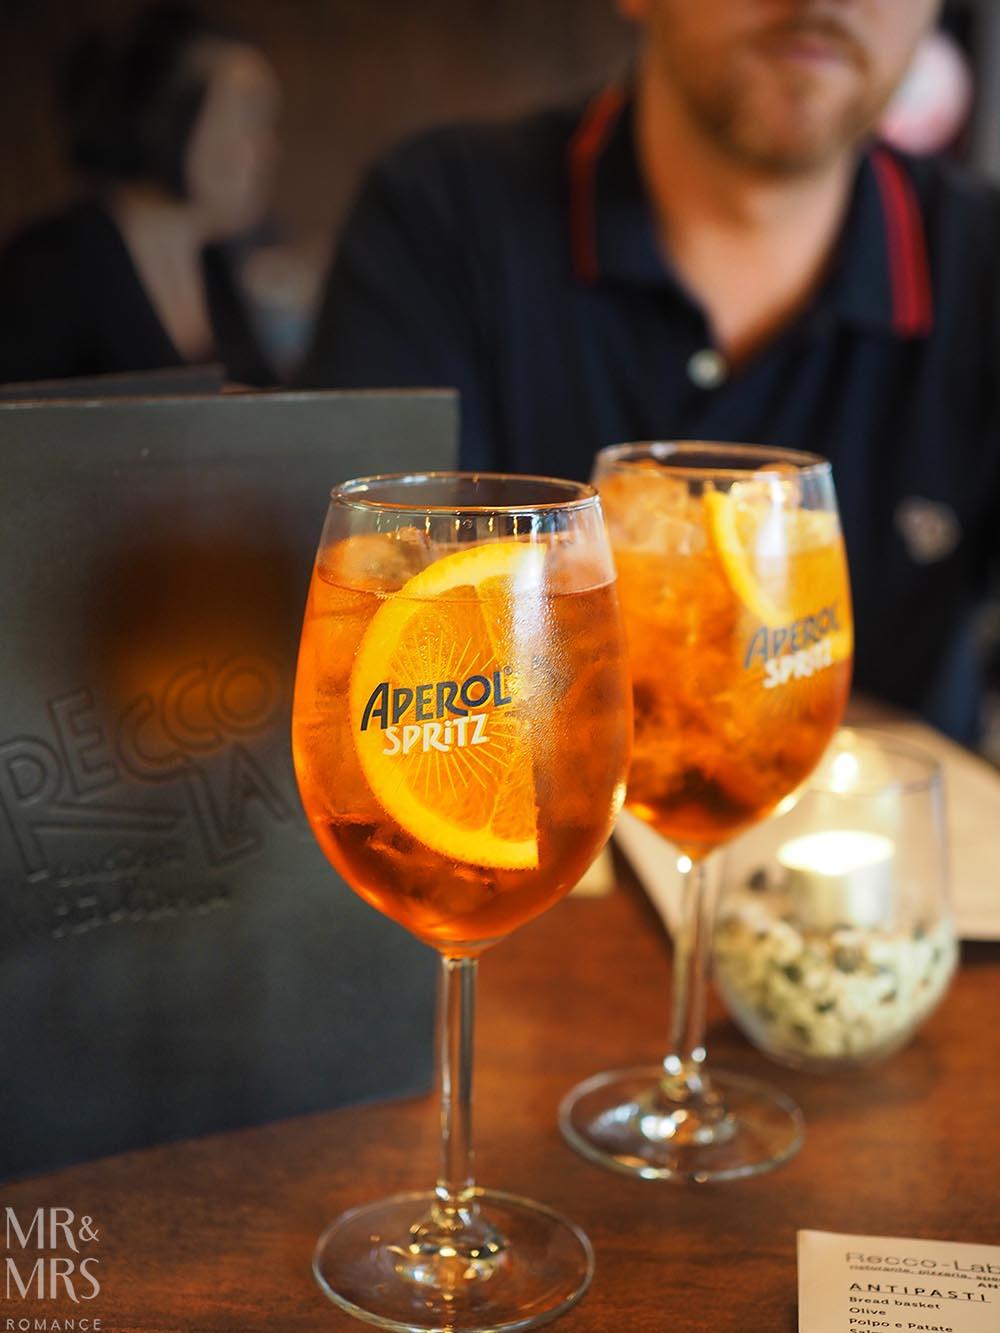 ReccoLab Rozelle - Sydney restaurant review - Aperol spritz